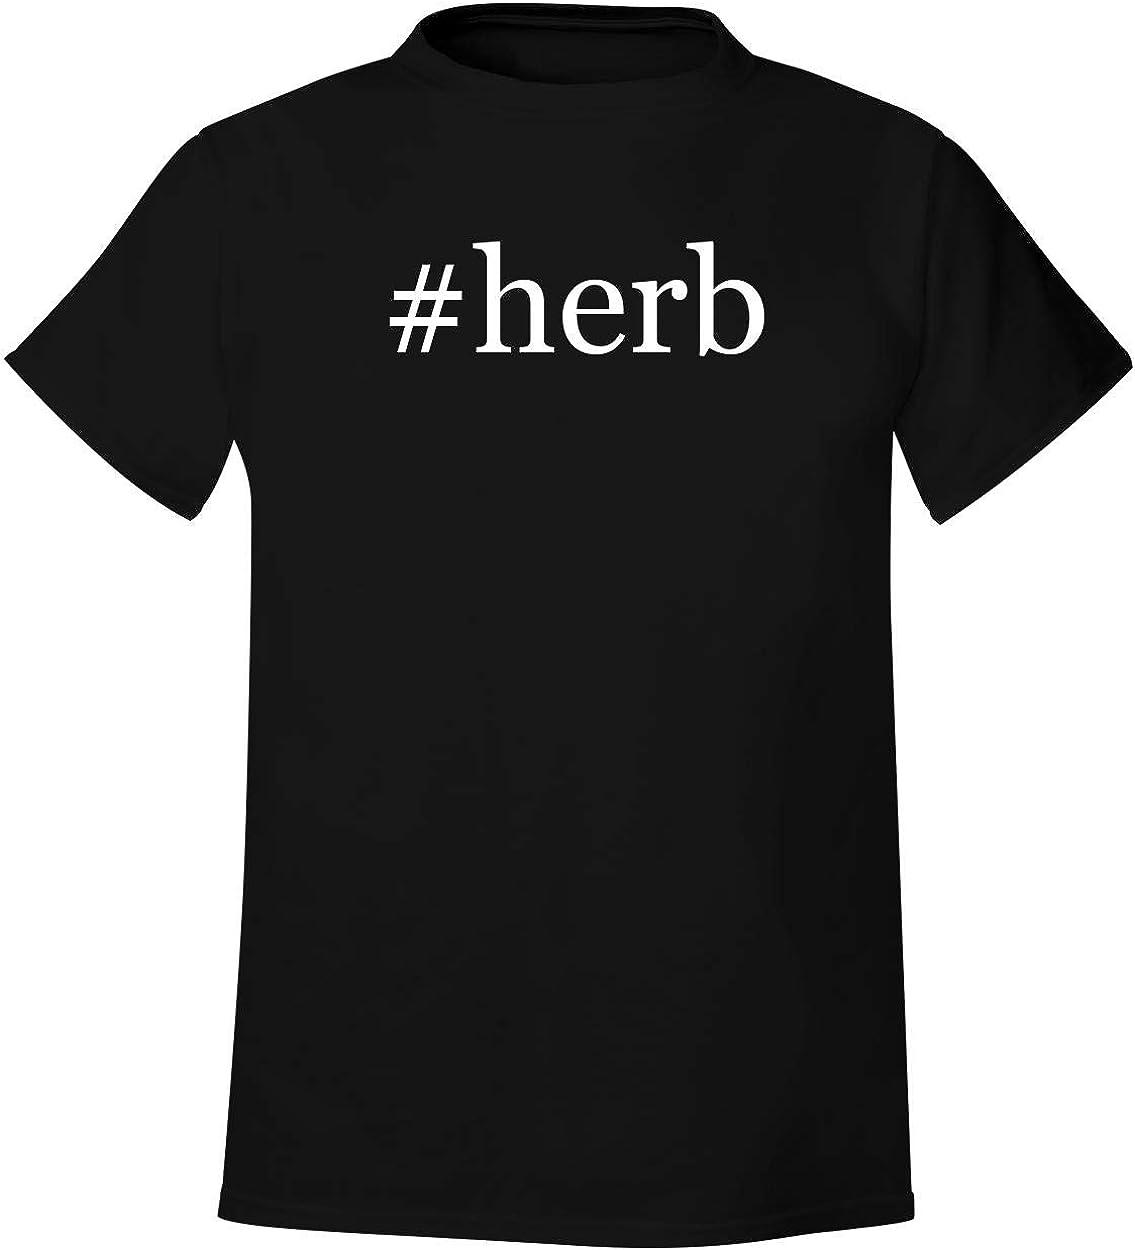 #herb - Men's Hashtag Soft & Comfortable T-Shirt